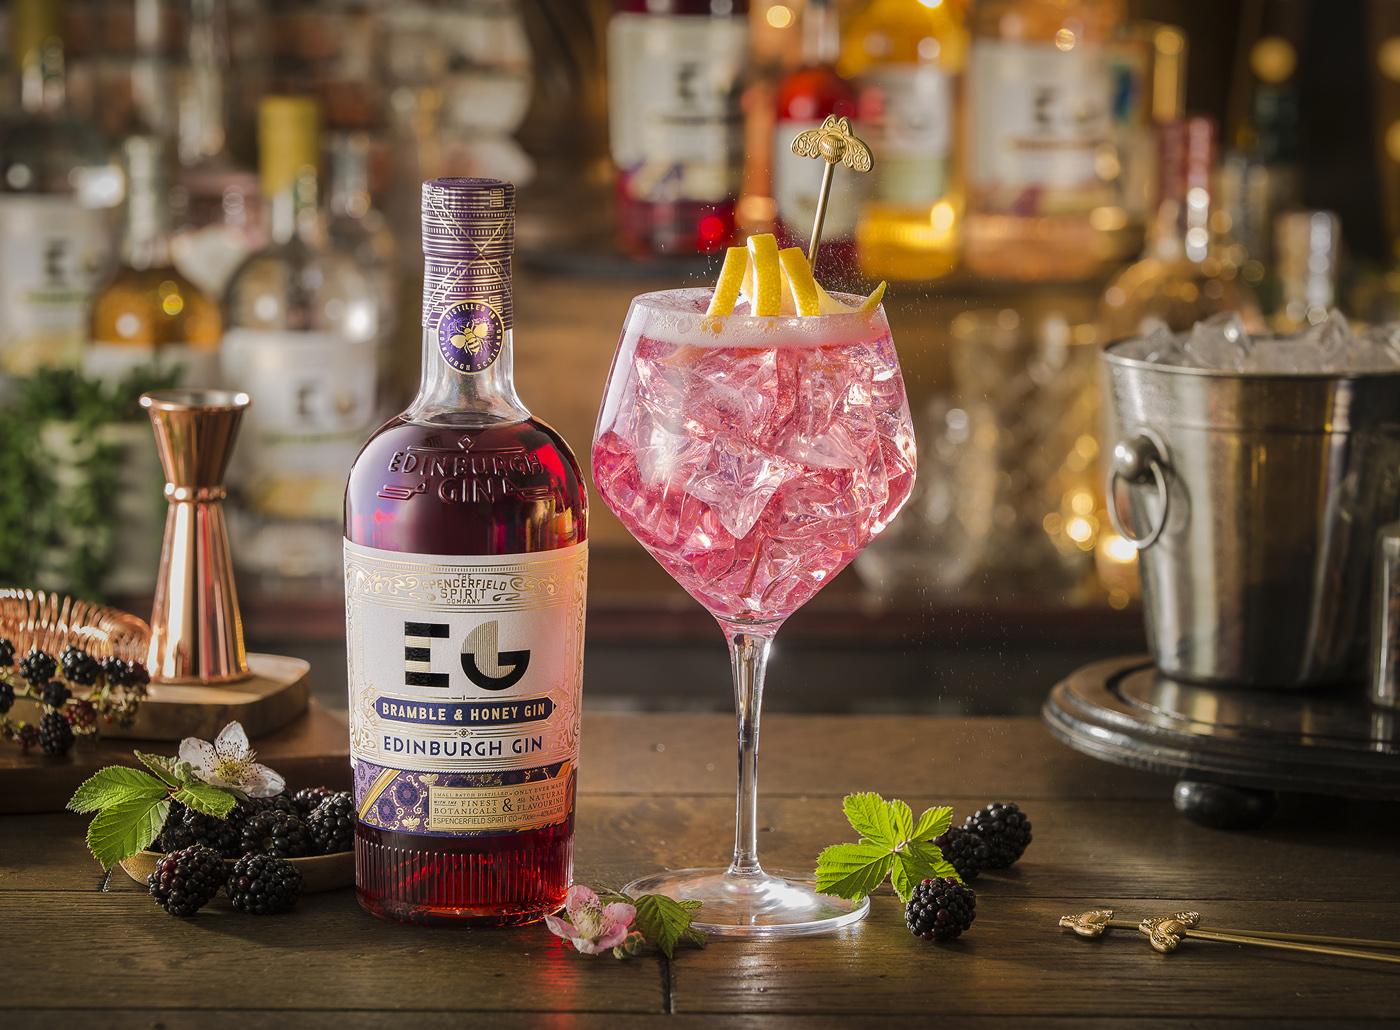 Ian Macleod Distillers y Edinburgh Gin lanzan Bramble & Honey